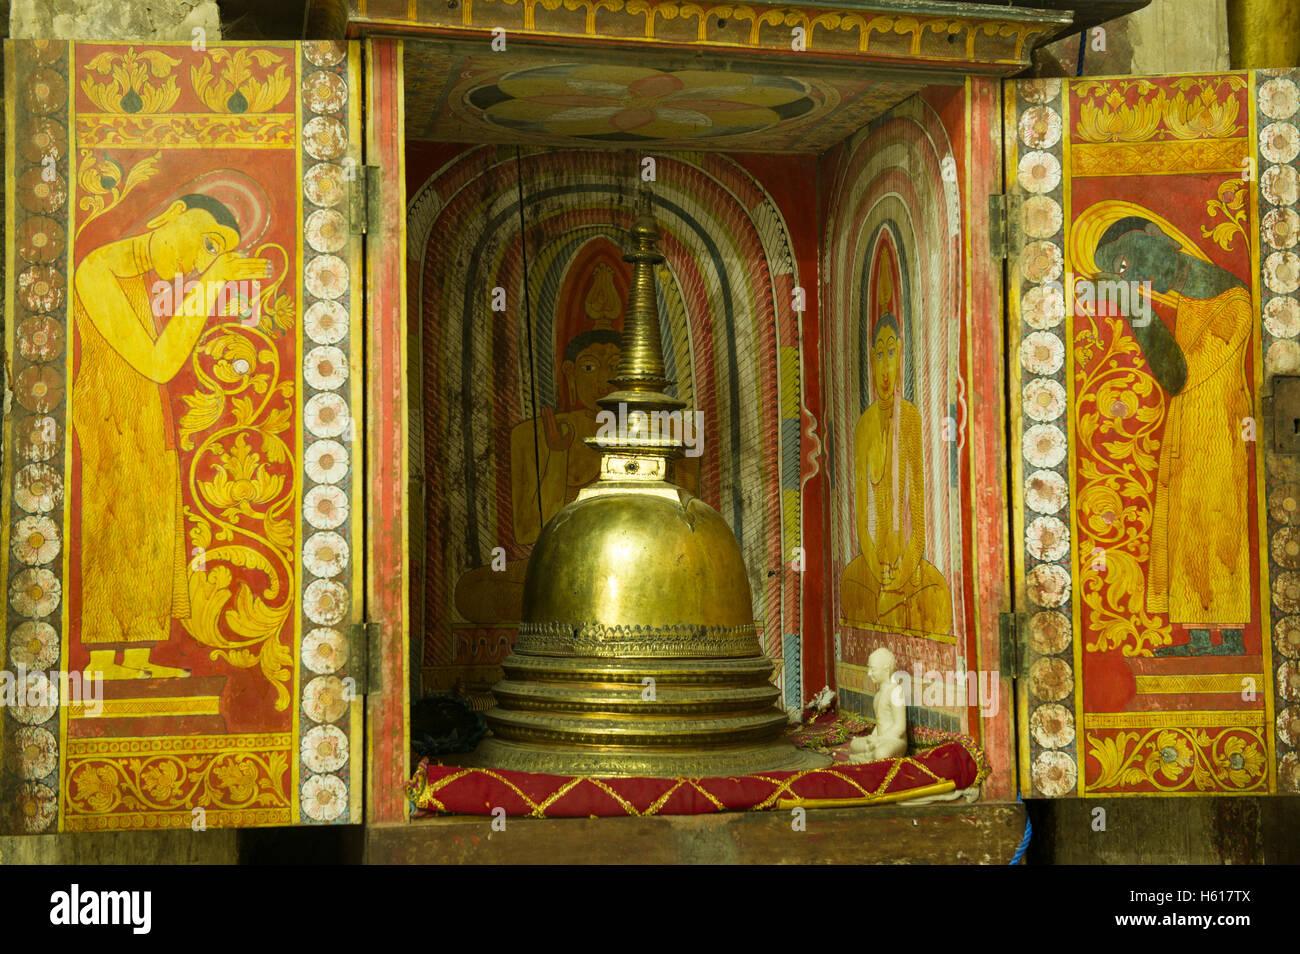 L'antiquité à Gadaladeniya Temple, Kandy, Sri Lanka Photo Stock